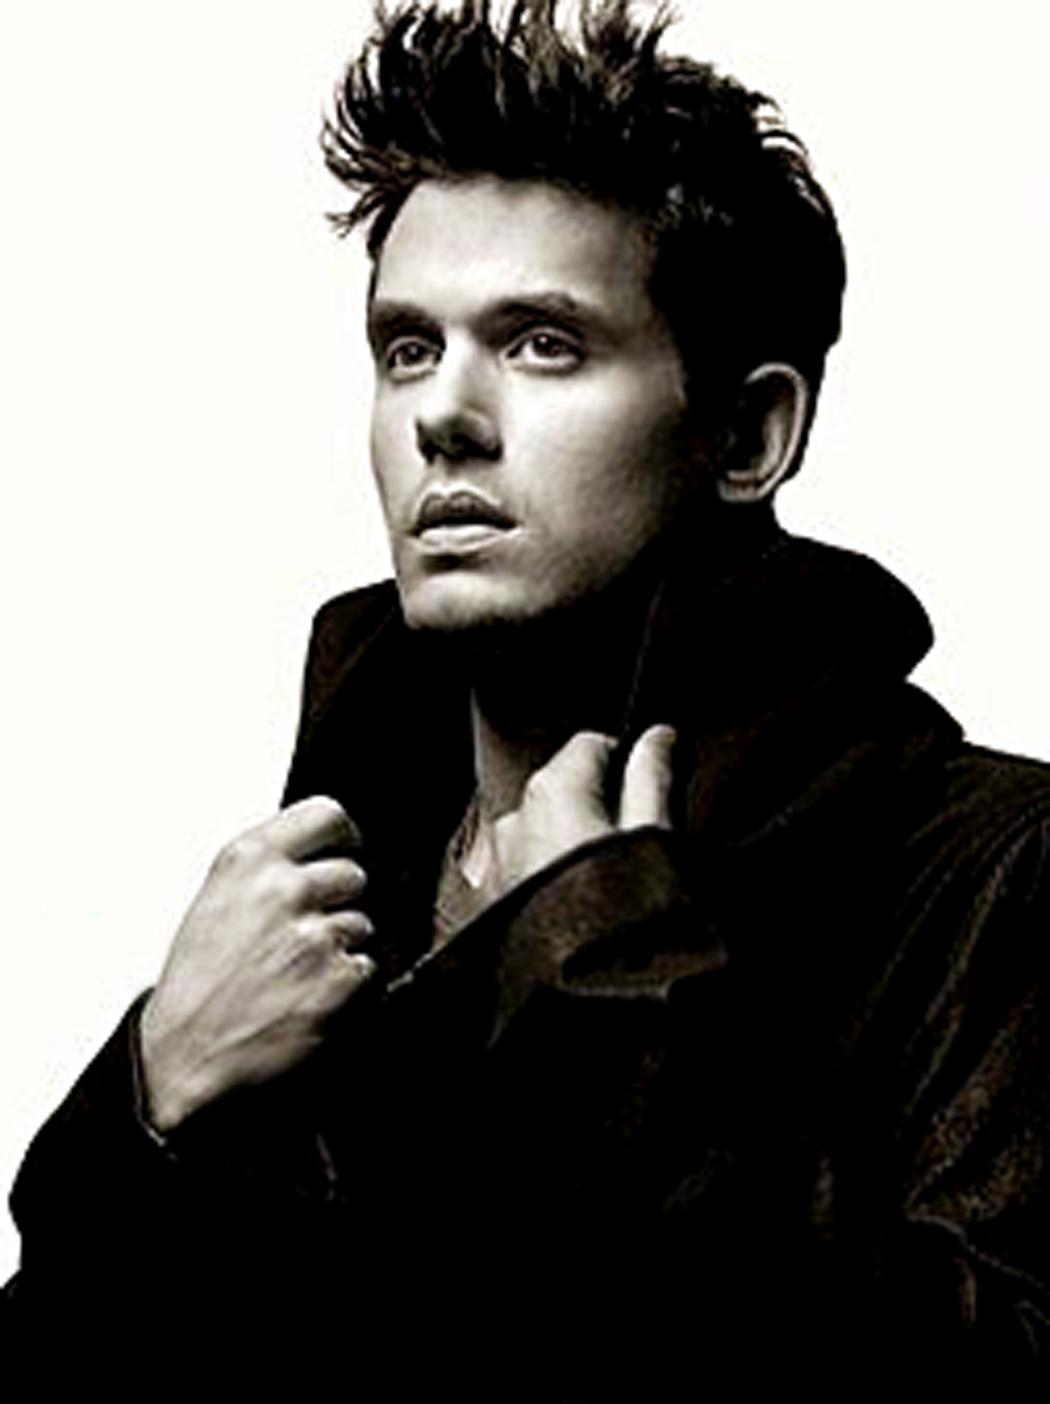 Wonderful John Mayer Image